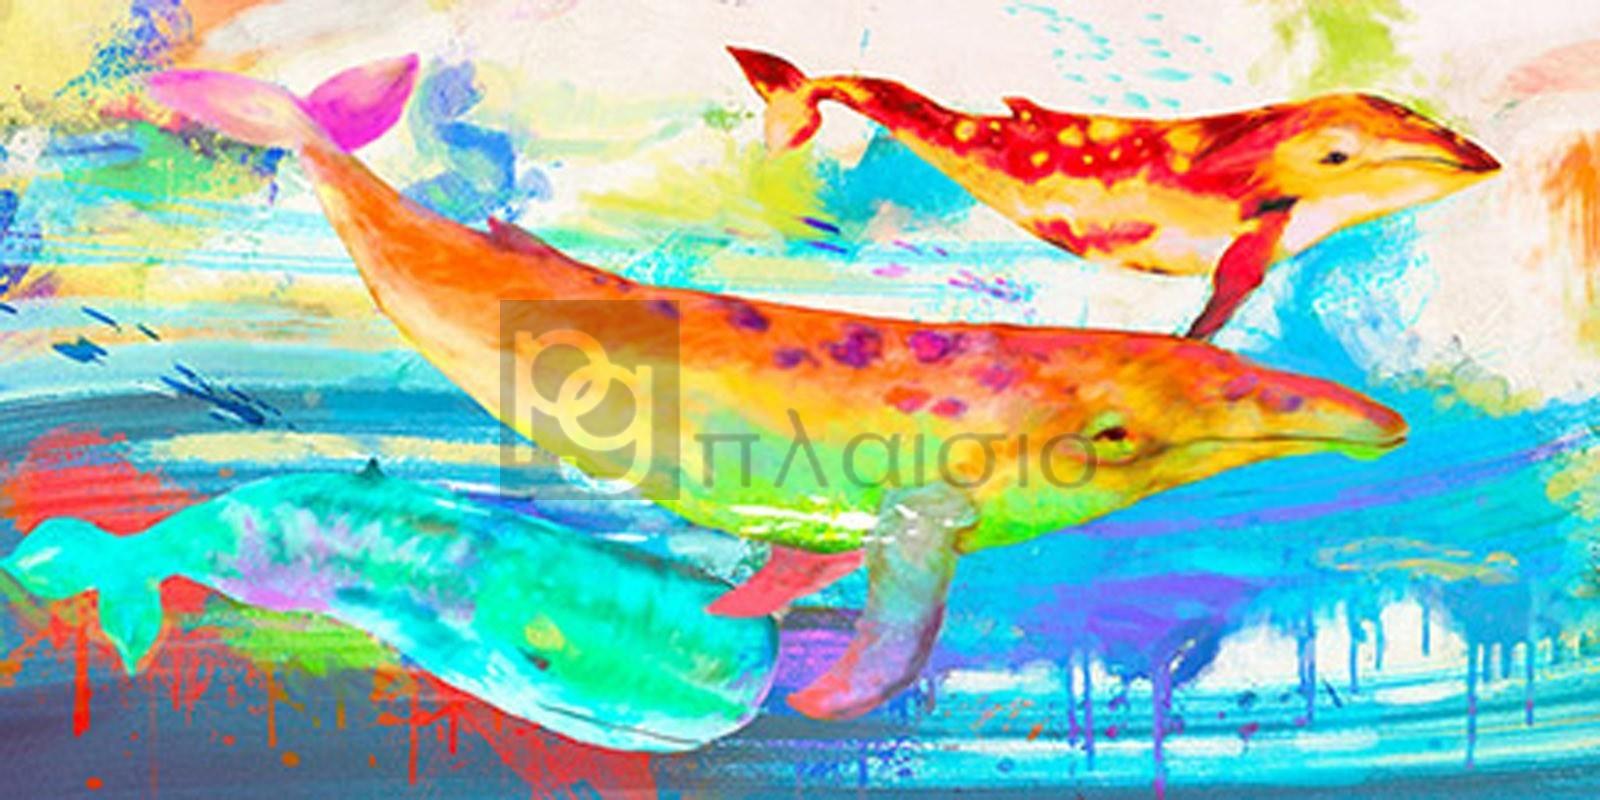 KELLY PARR - Oceanic Divinities